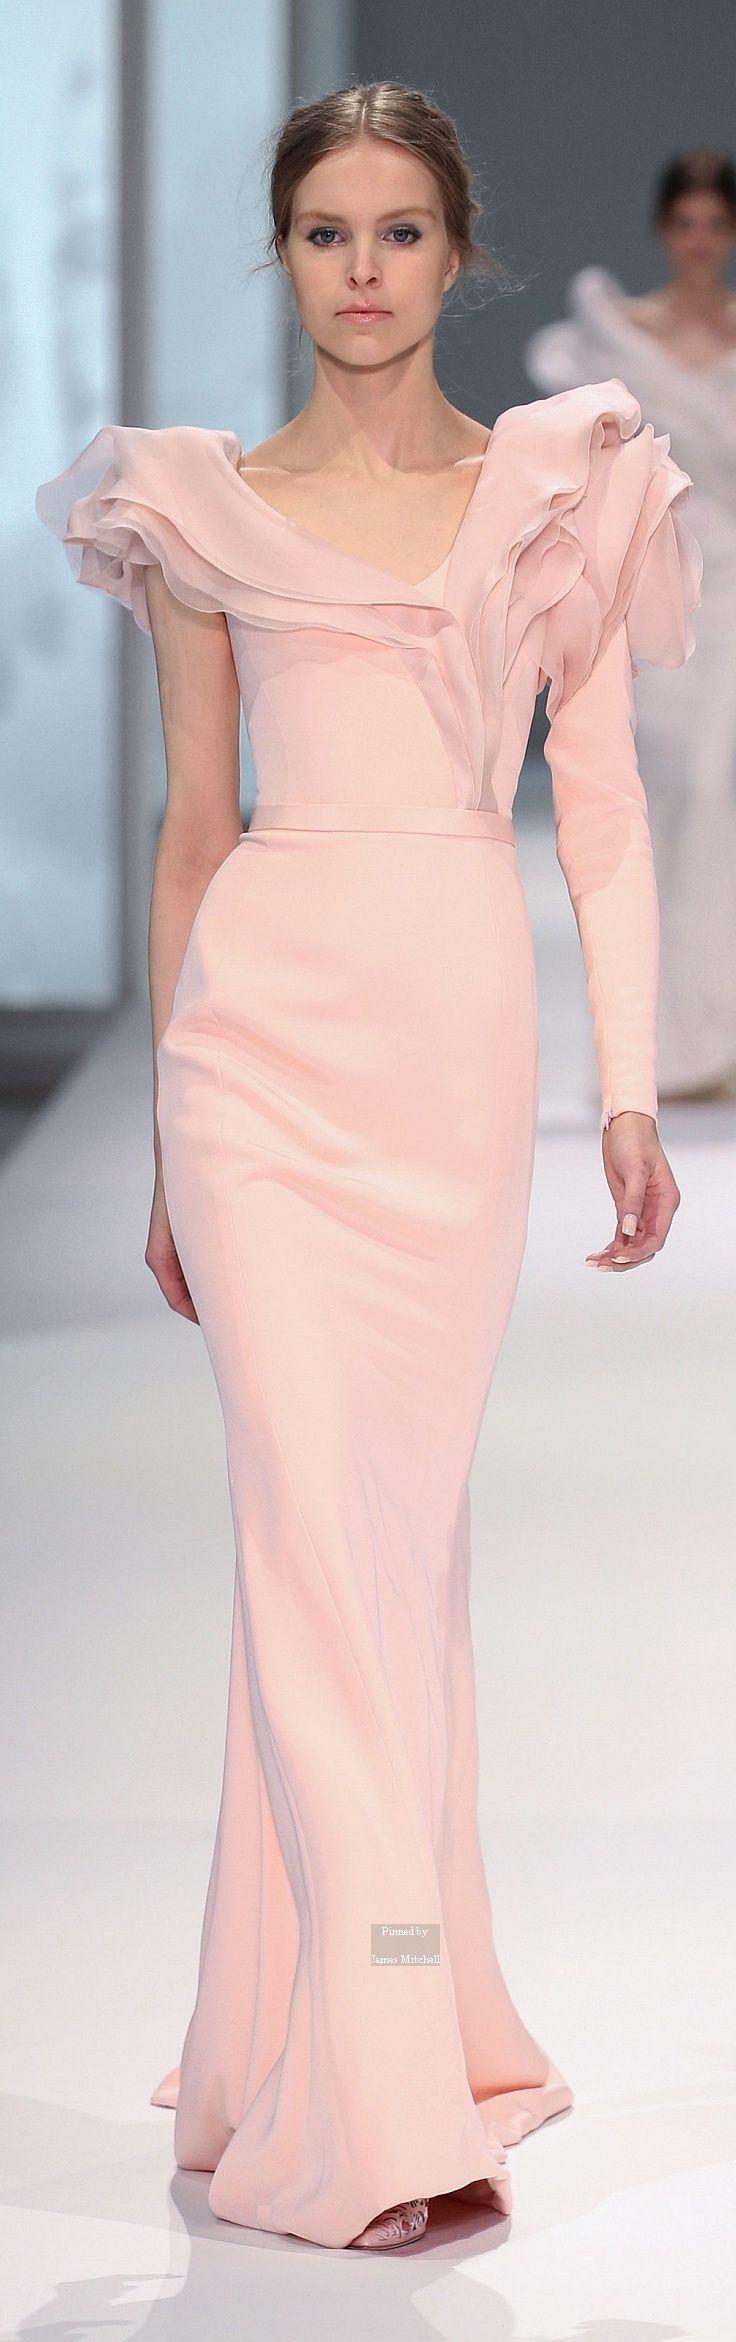 Ralph & Russo Spring/Summer 2015 Couture | La novia, Couture y Perfecta